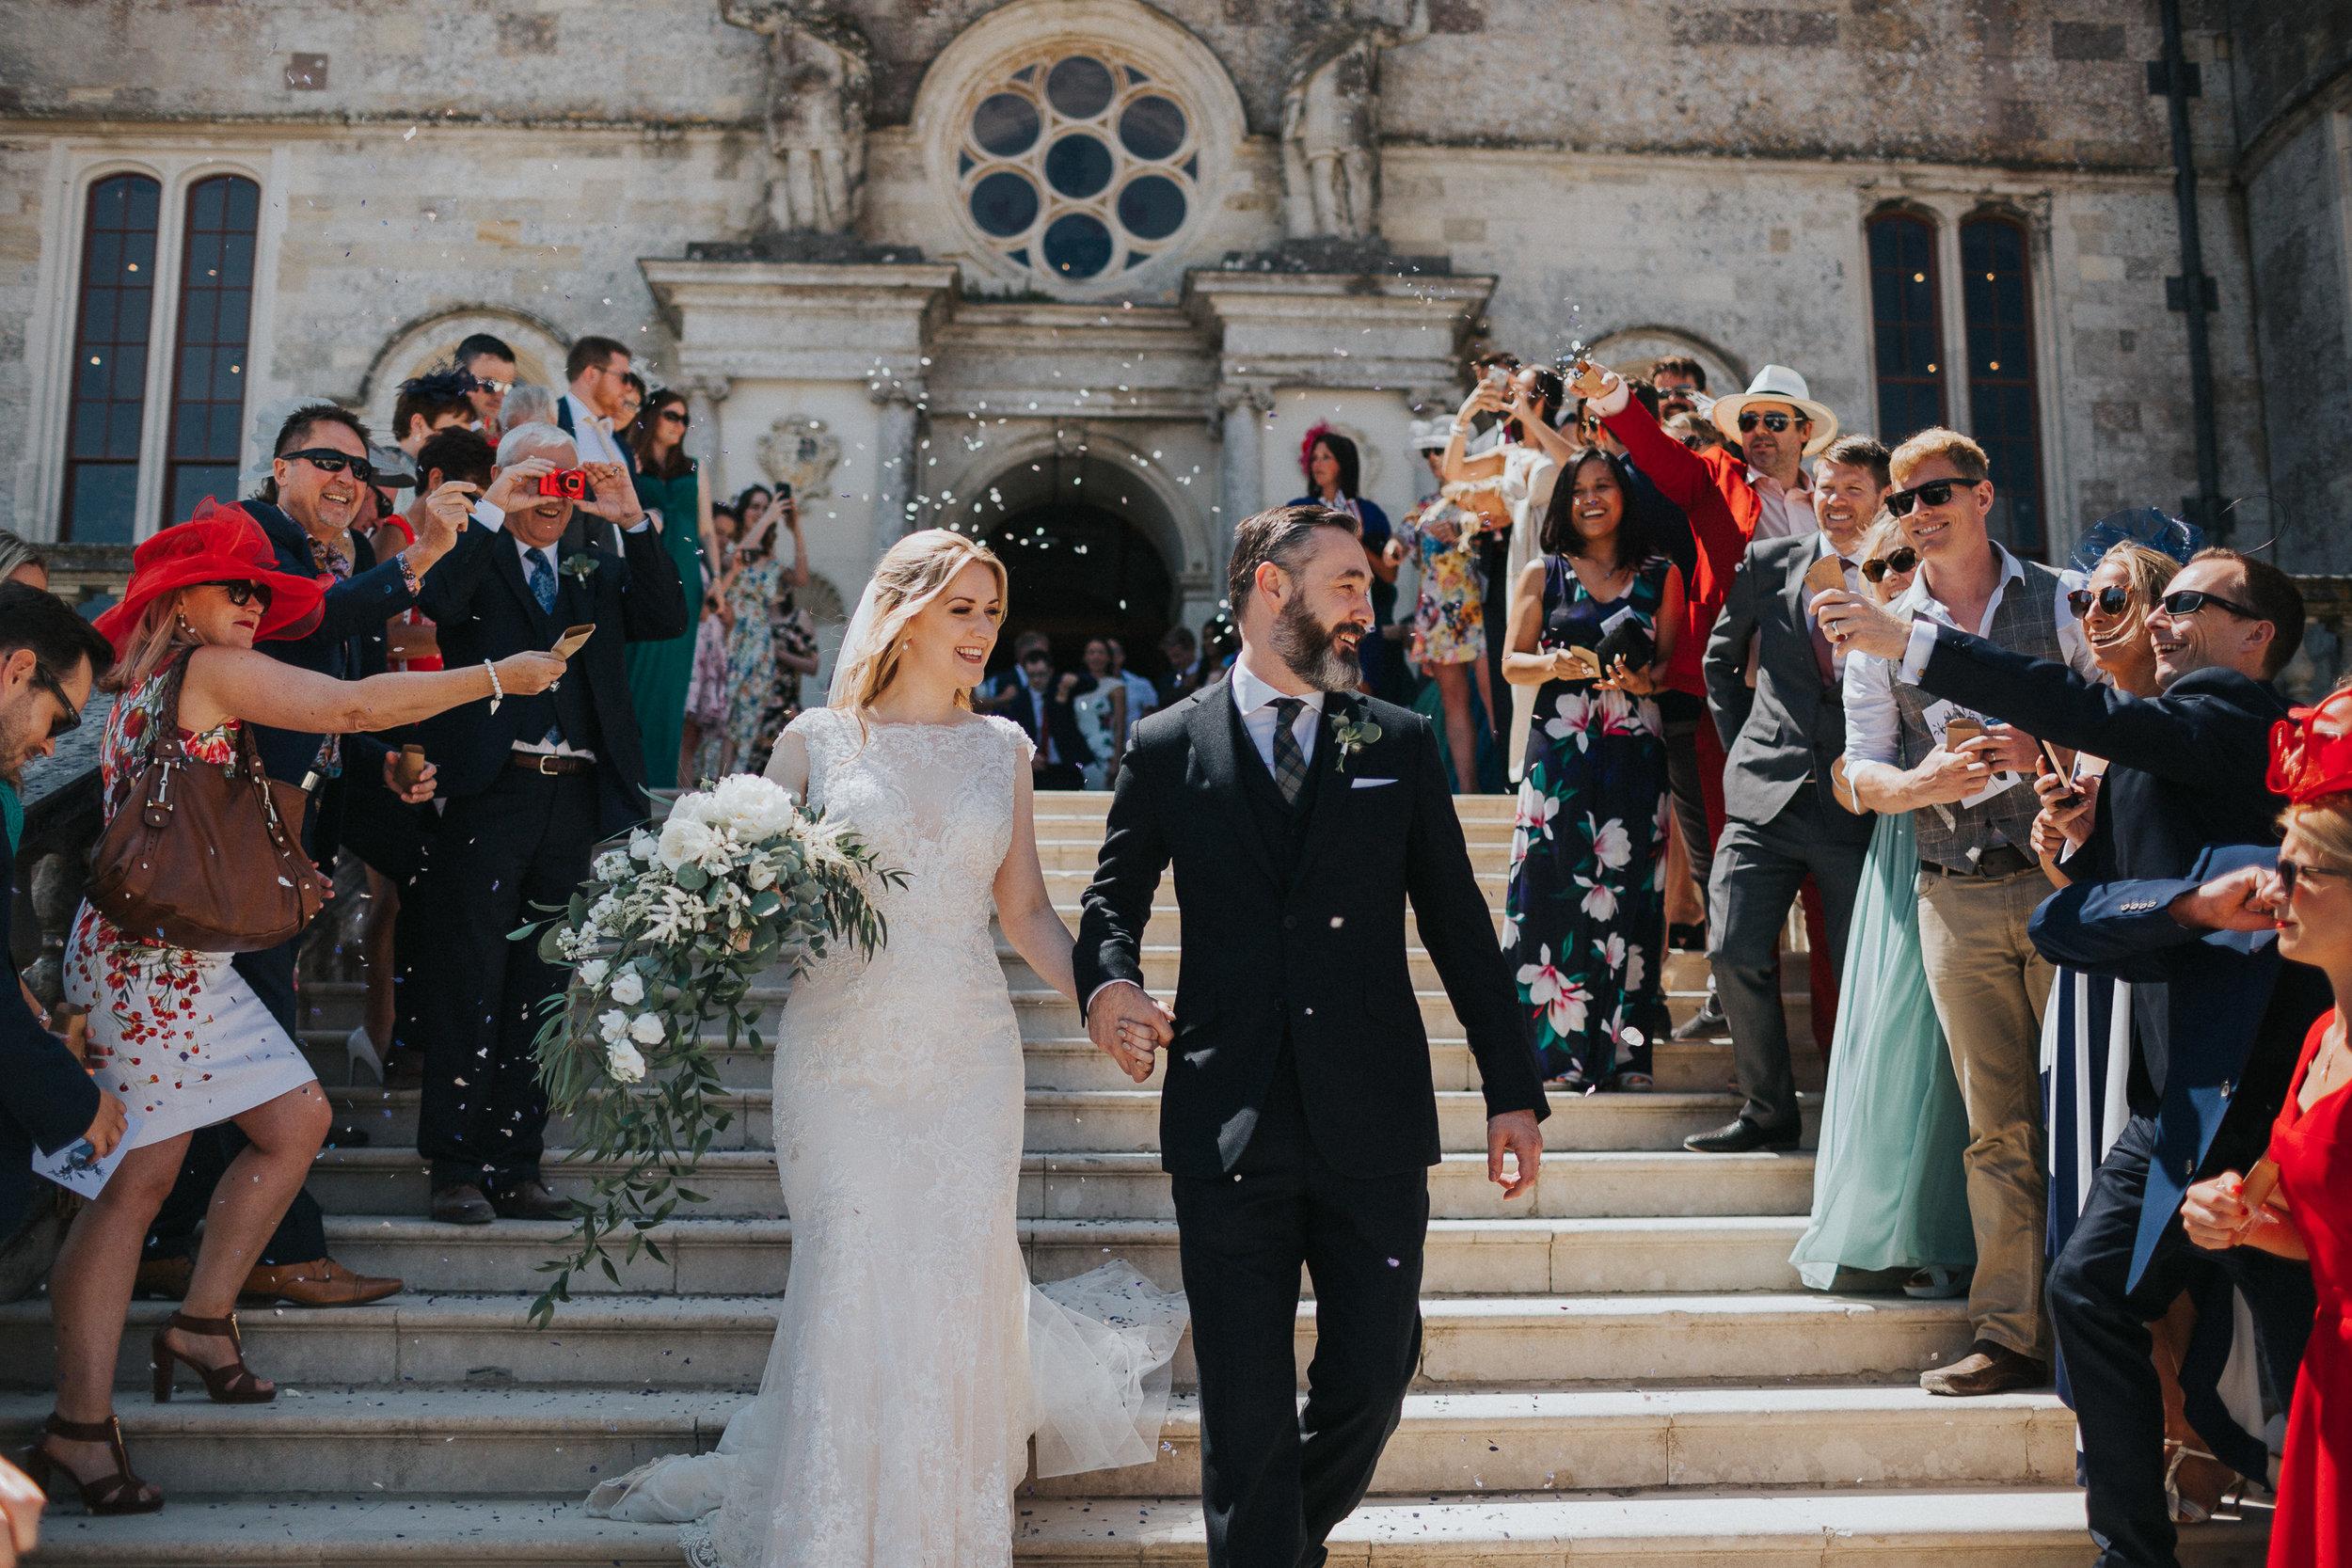 Lulworth Castle Wedding Photos029.jpg